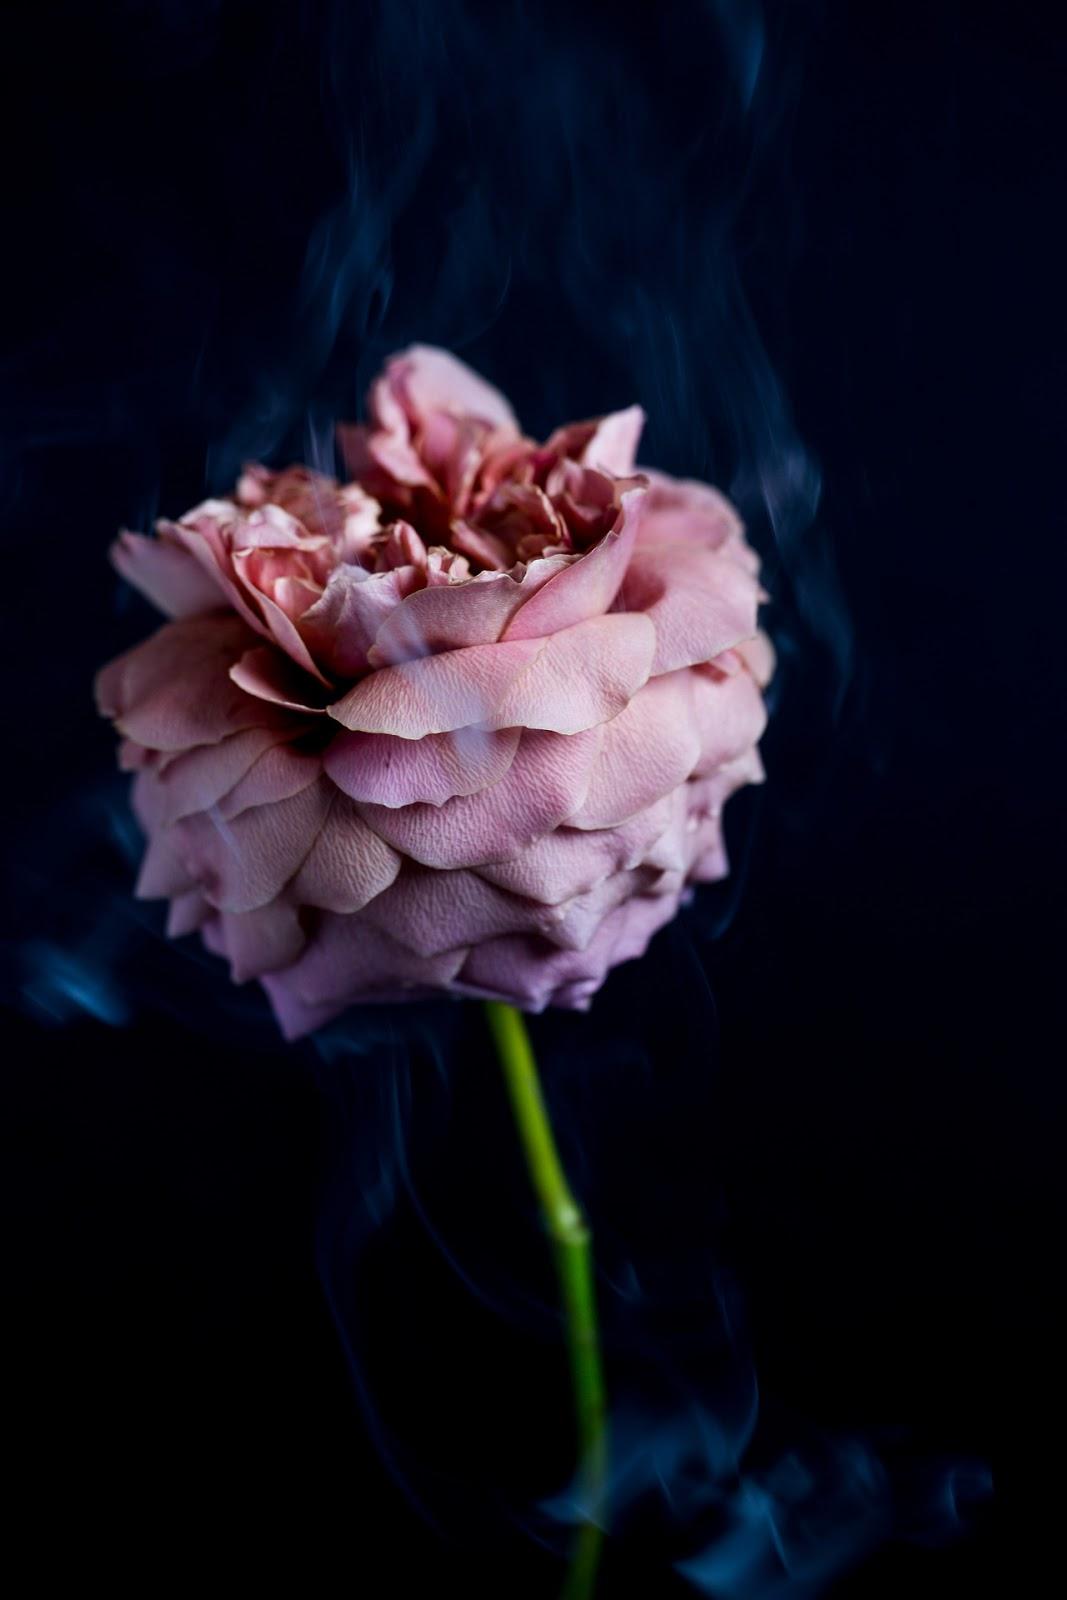 All The Pretty Flowers September 16 2017 Zsazsa Bellagio Like